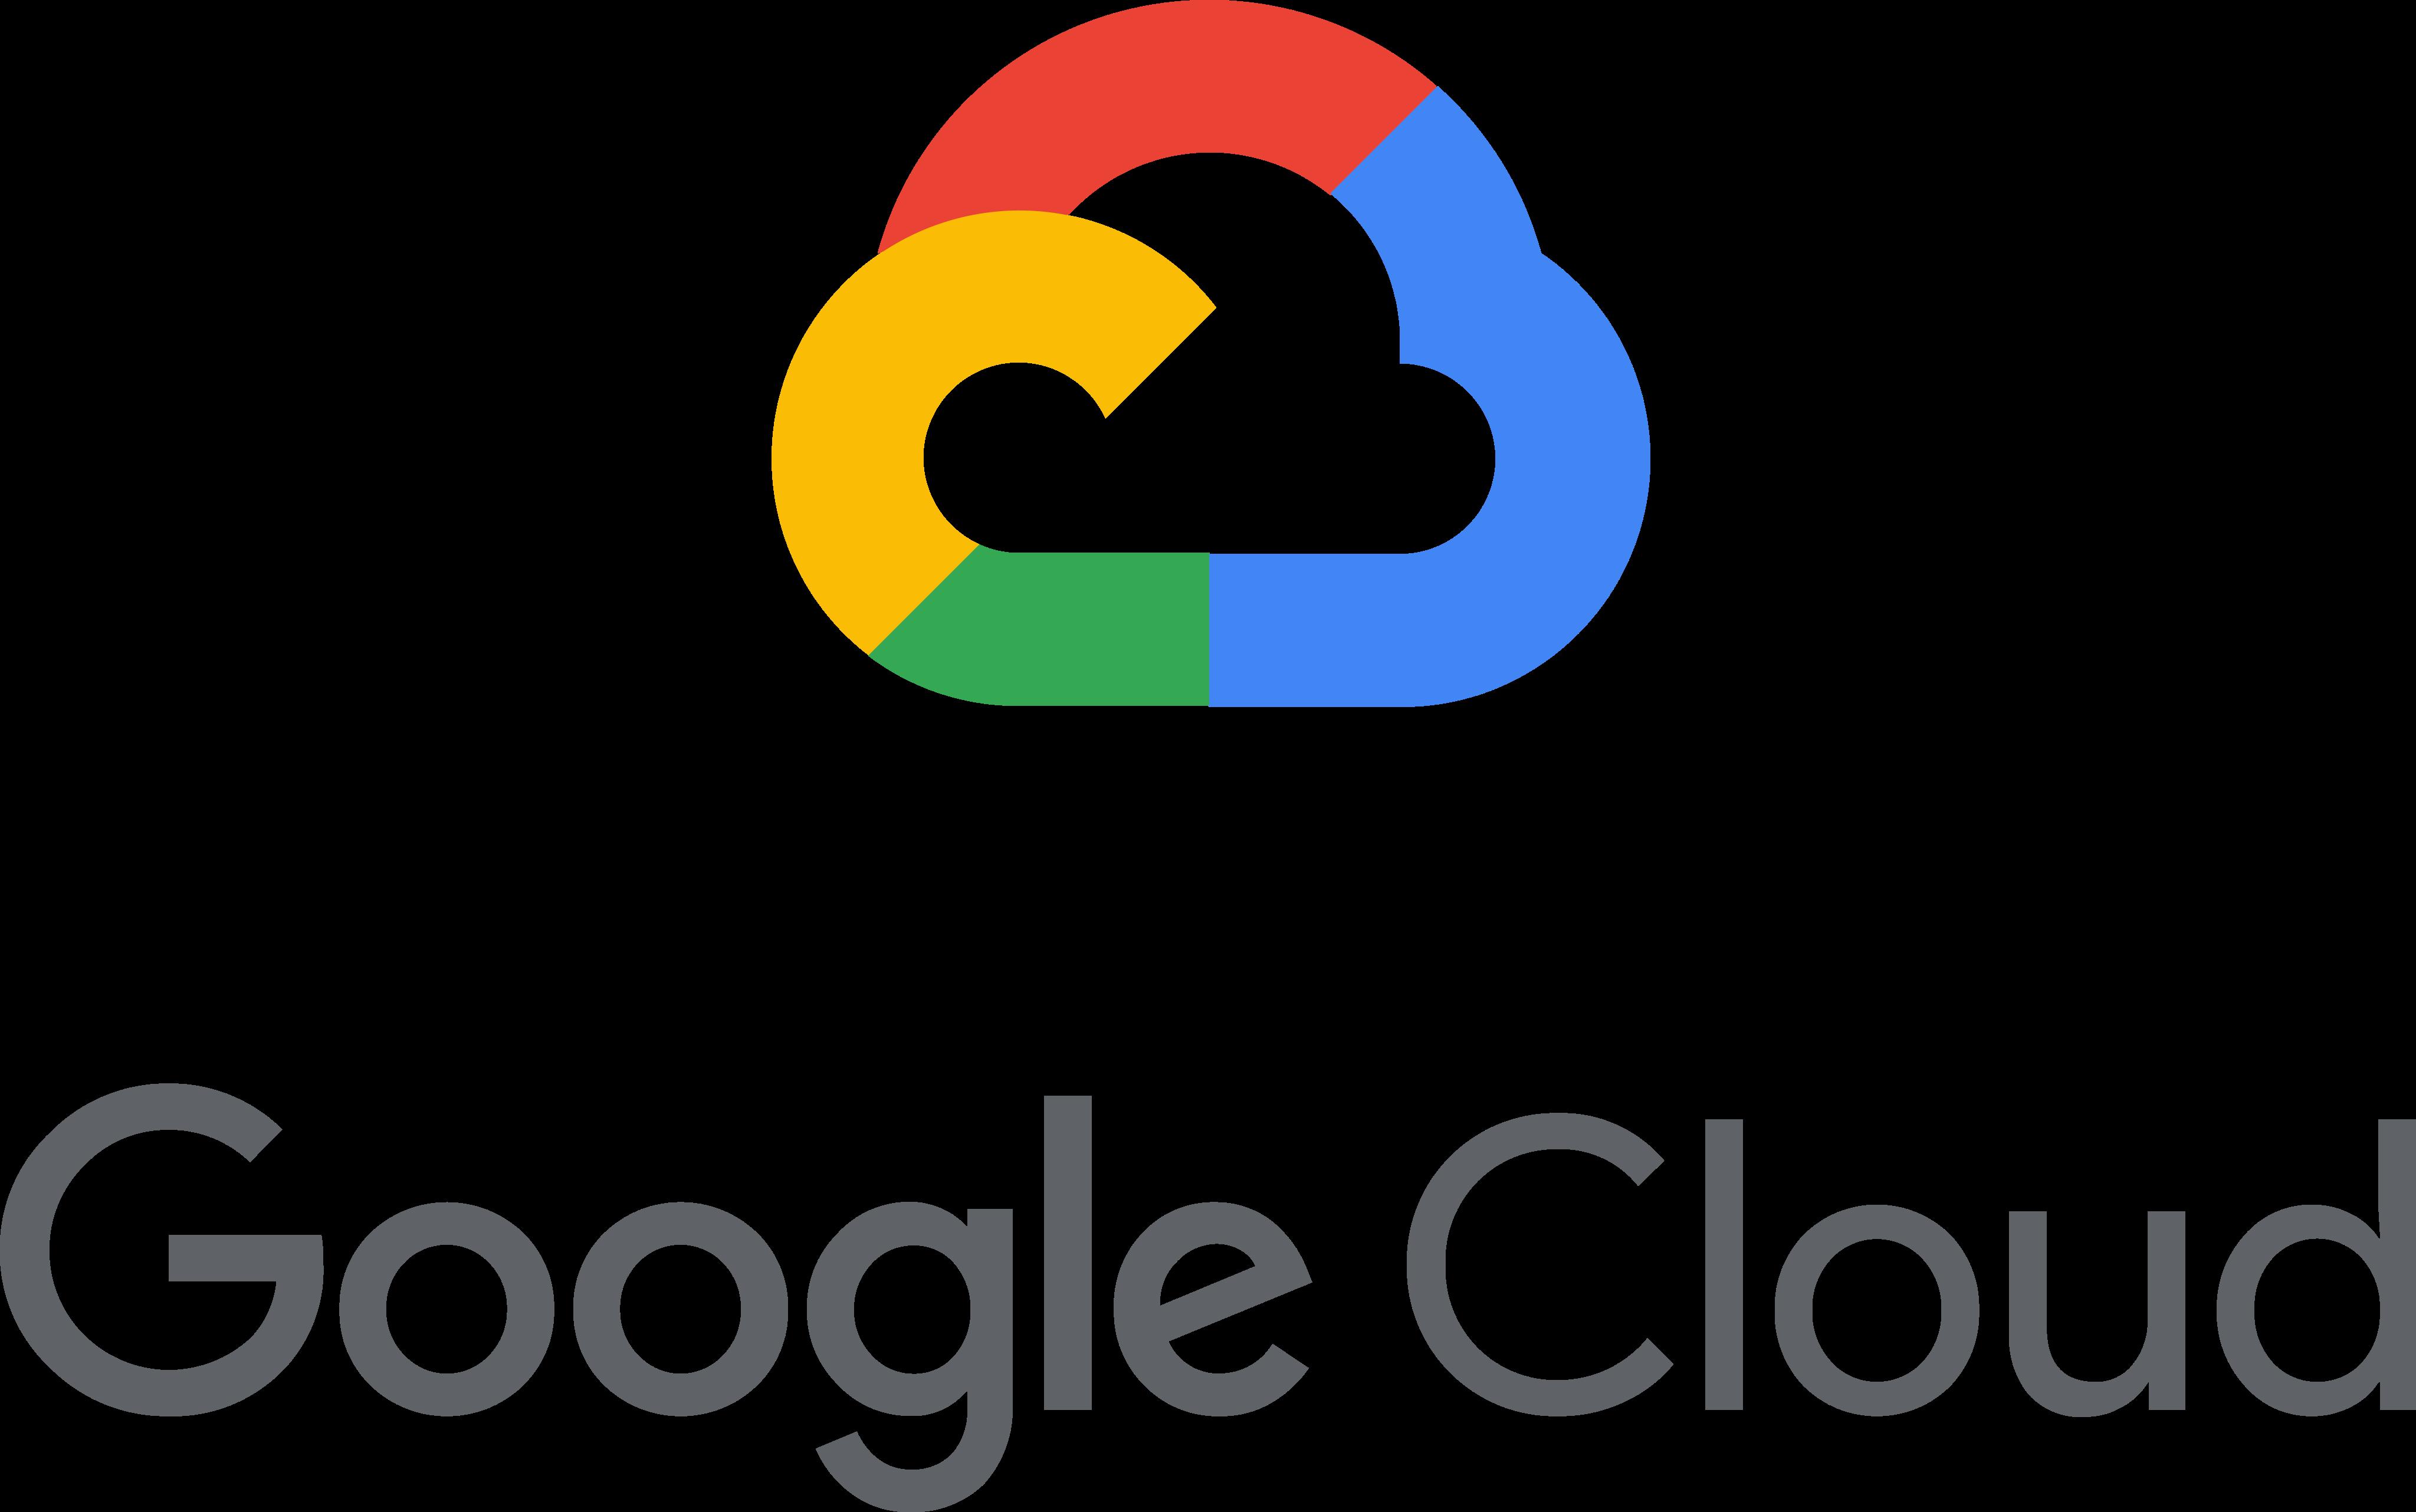 google cloud logo 1 - Google Cloud Logo